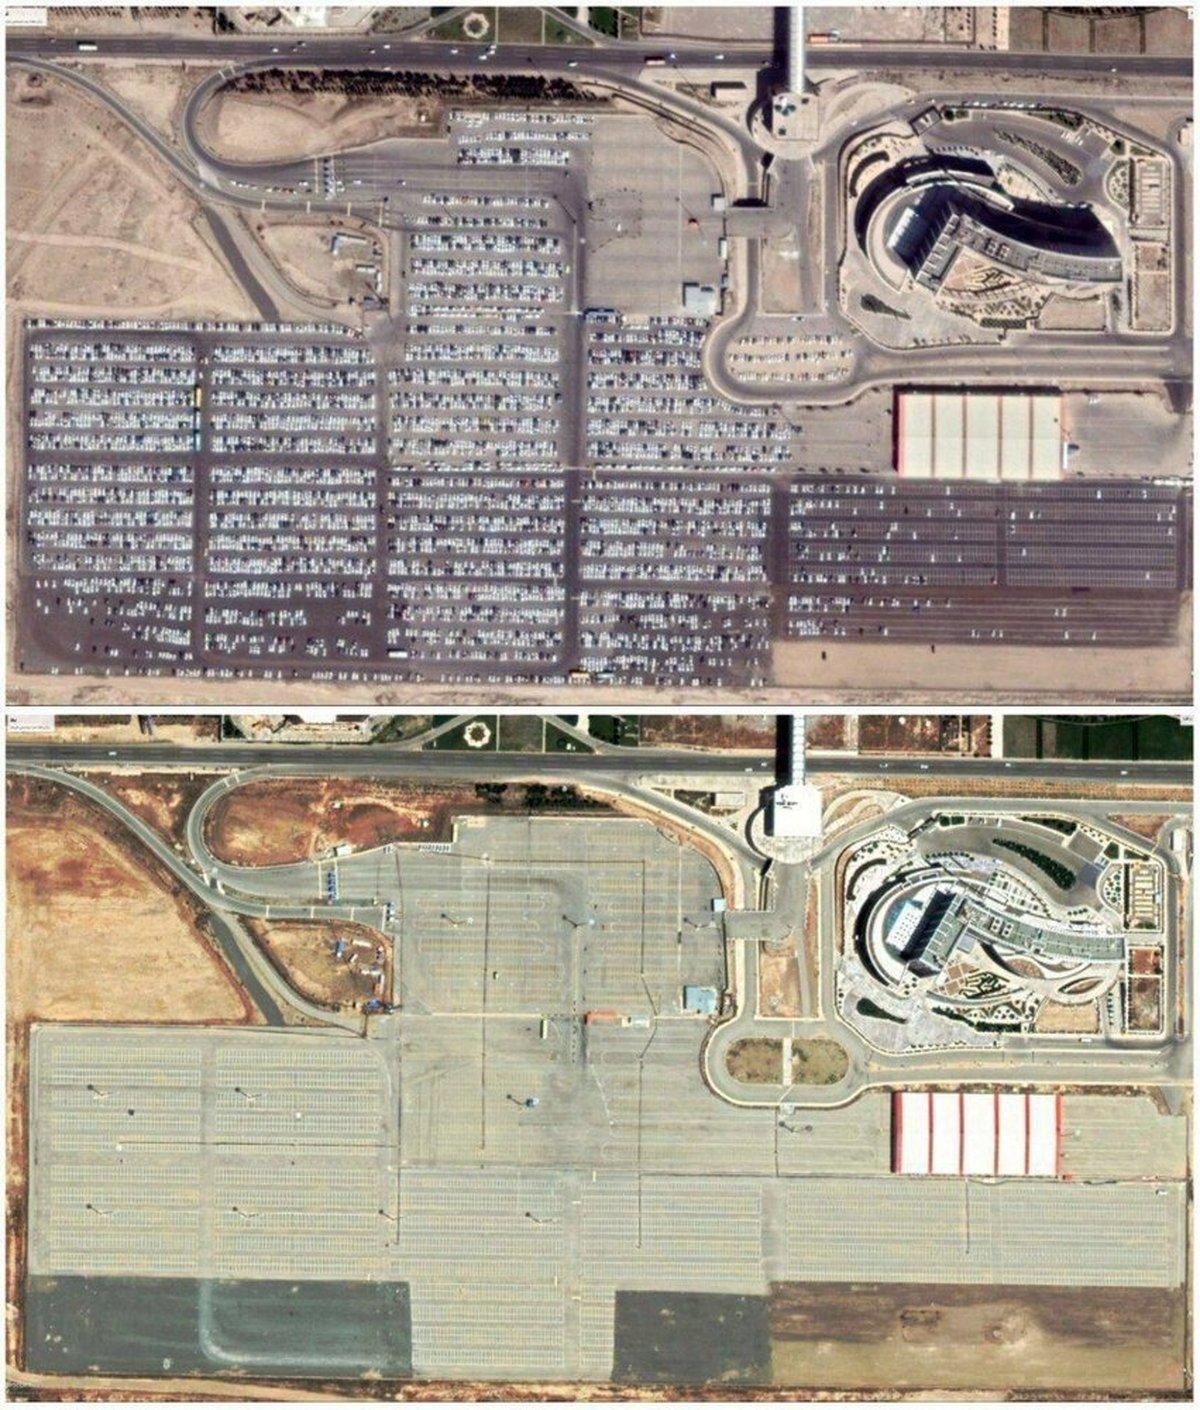 کرونا |   پارکینگ فرودگاه امام، قبل و بعد از کرونا+عکس